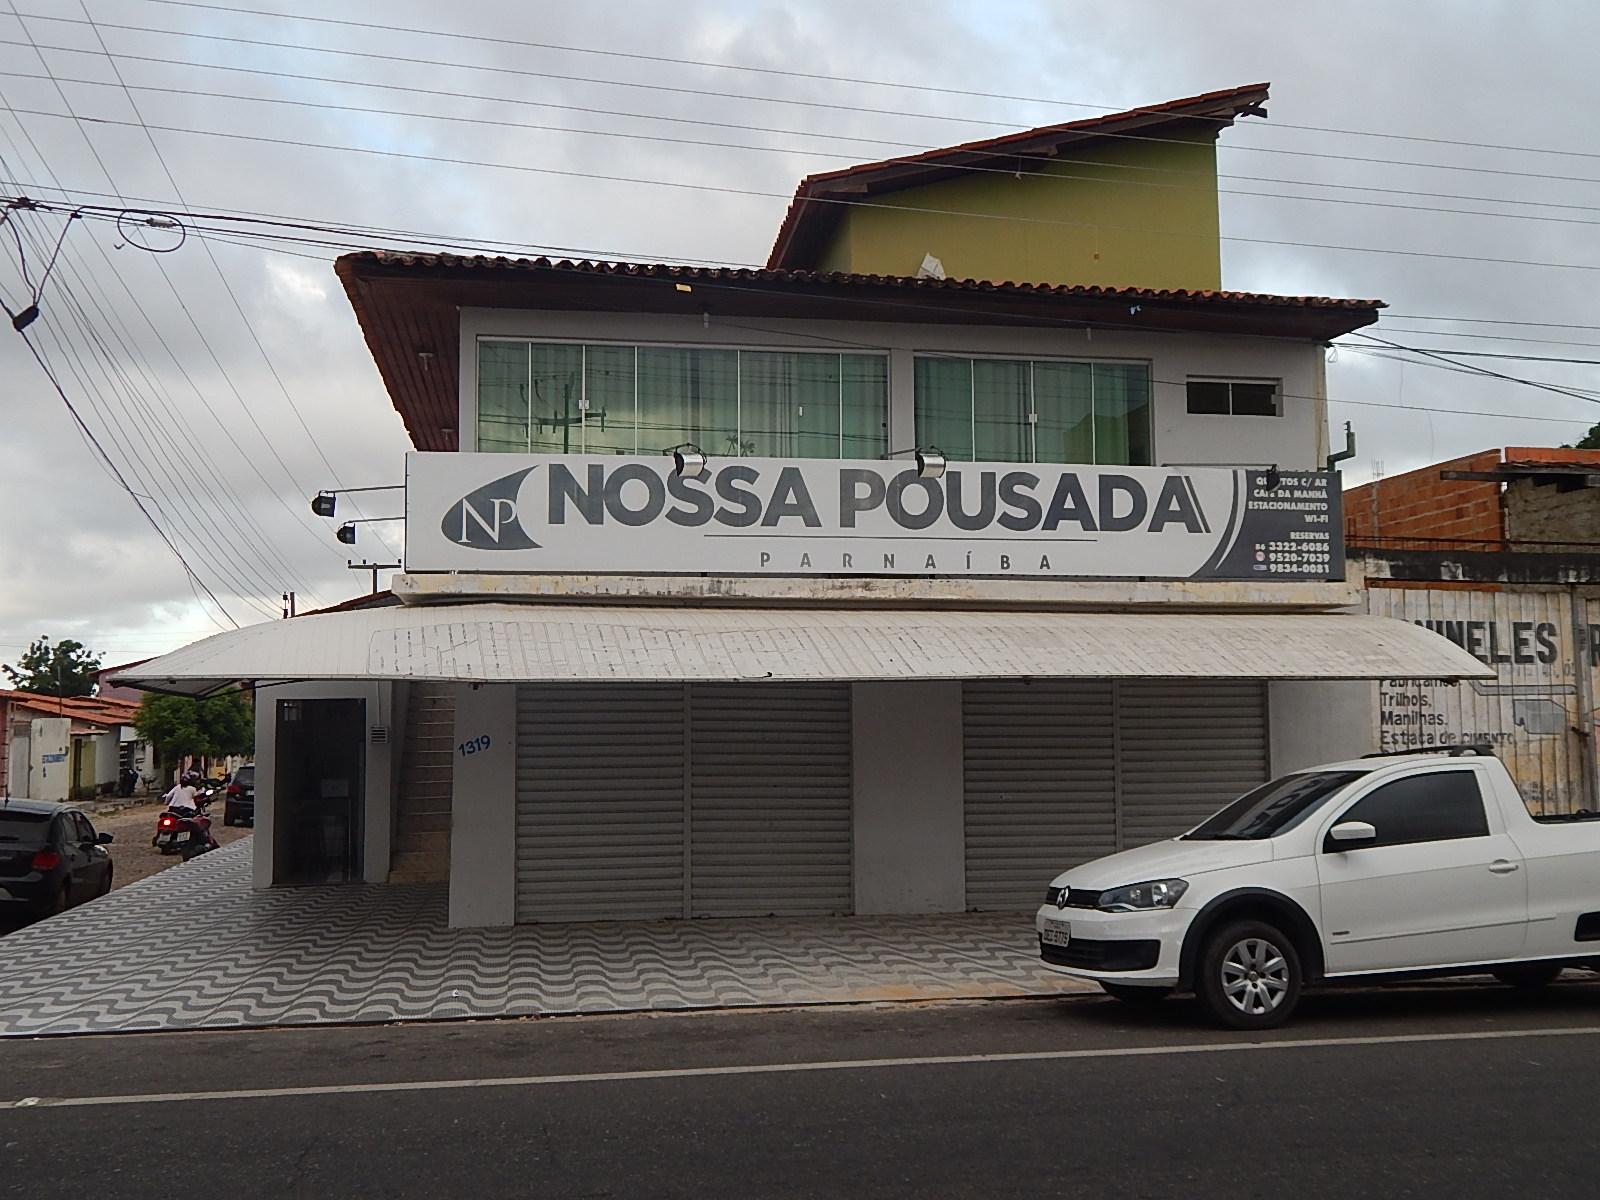 NOSSA POUSADA PARNAÍBA